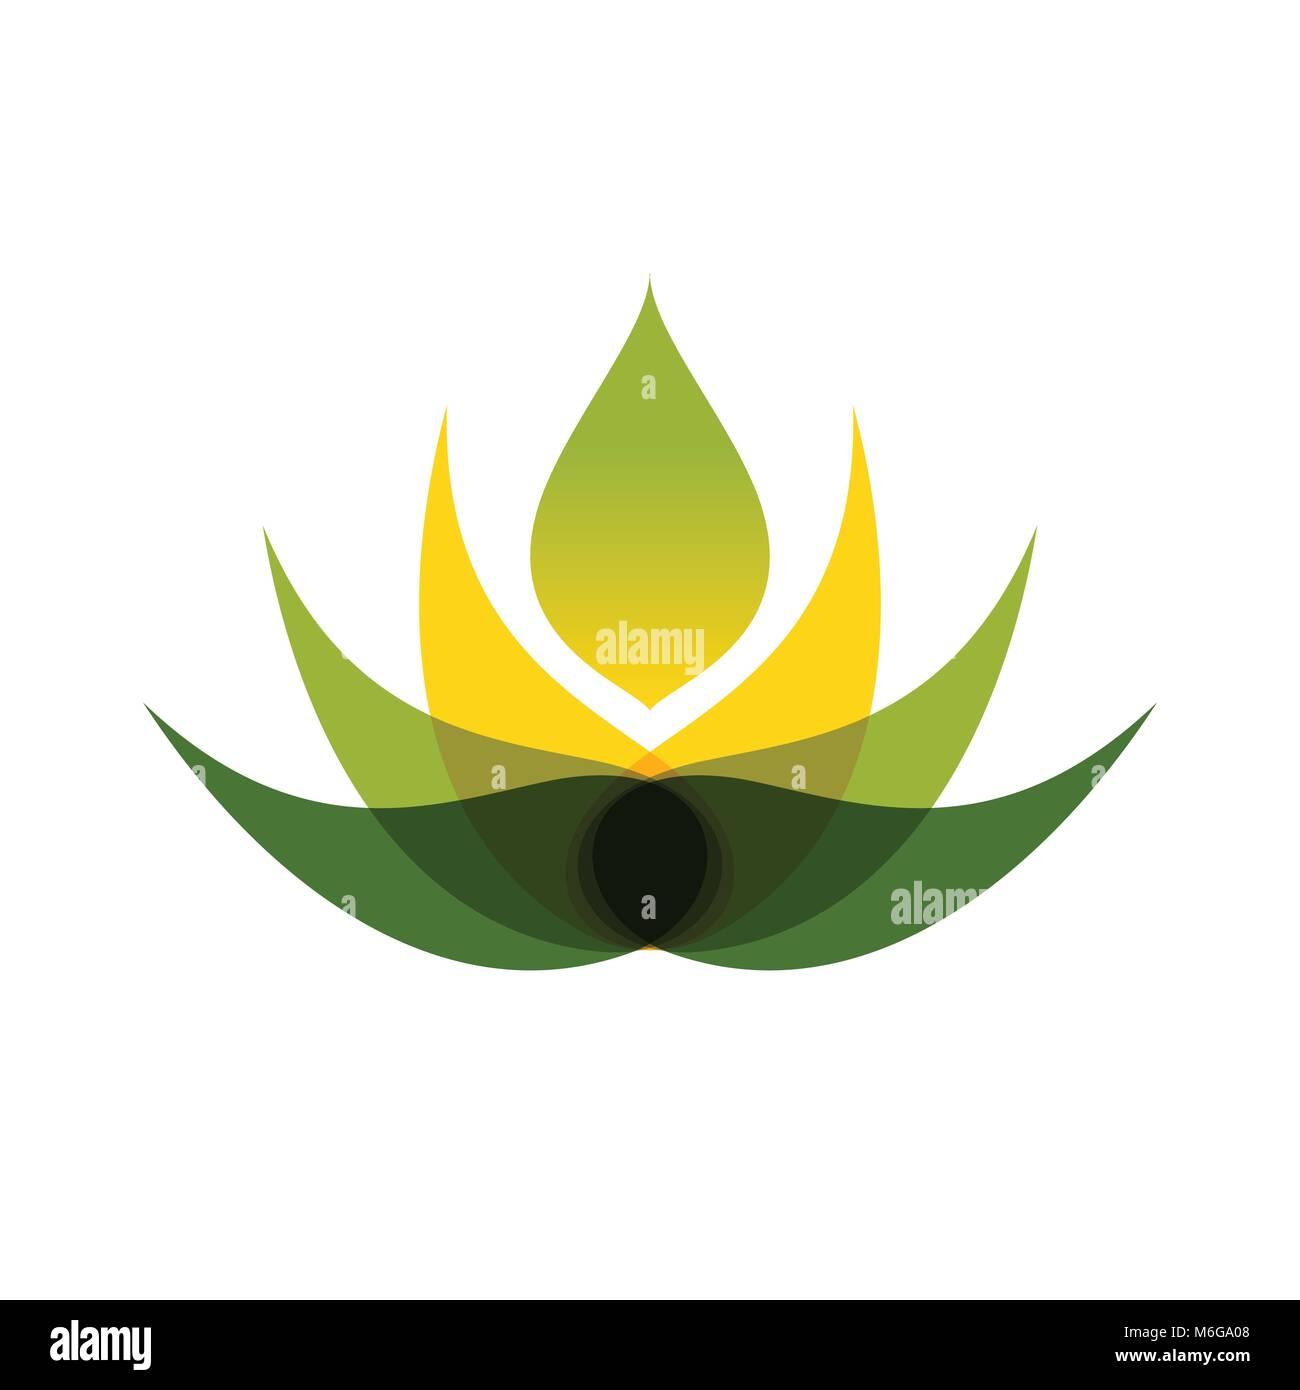 Lotus flower logo creative abstract stock photos lotus flower logo abstract multiply lotus flower vector symbol graphic logo design stock image izmirmasajfo